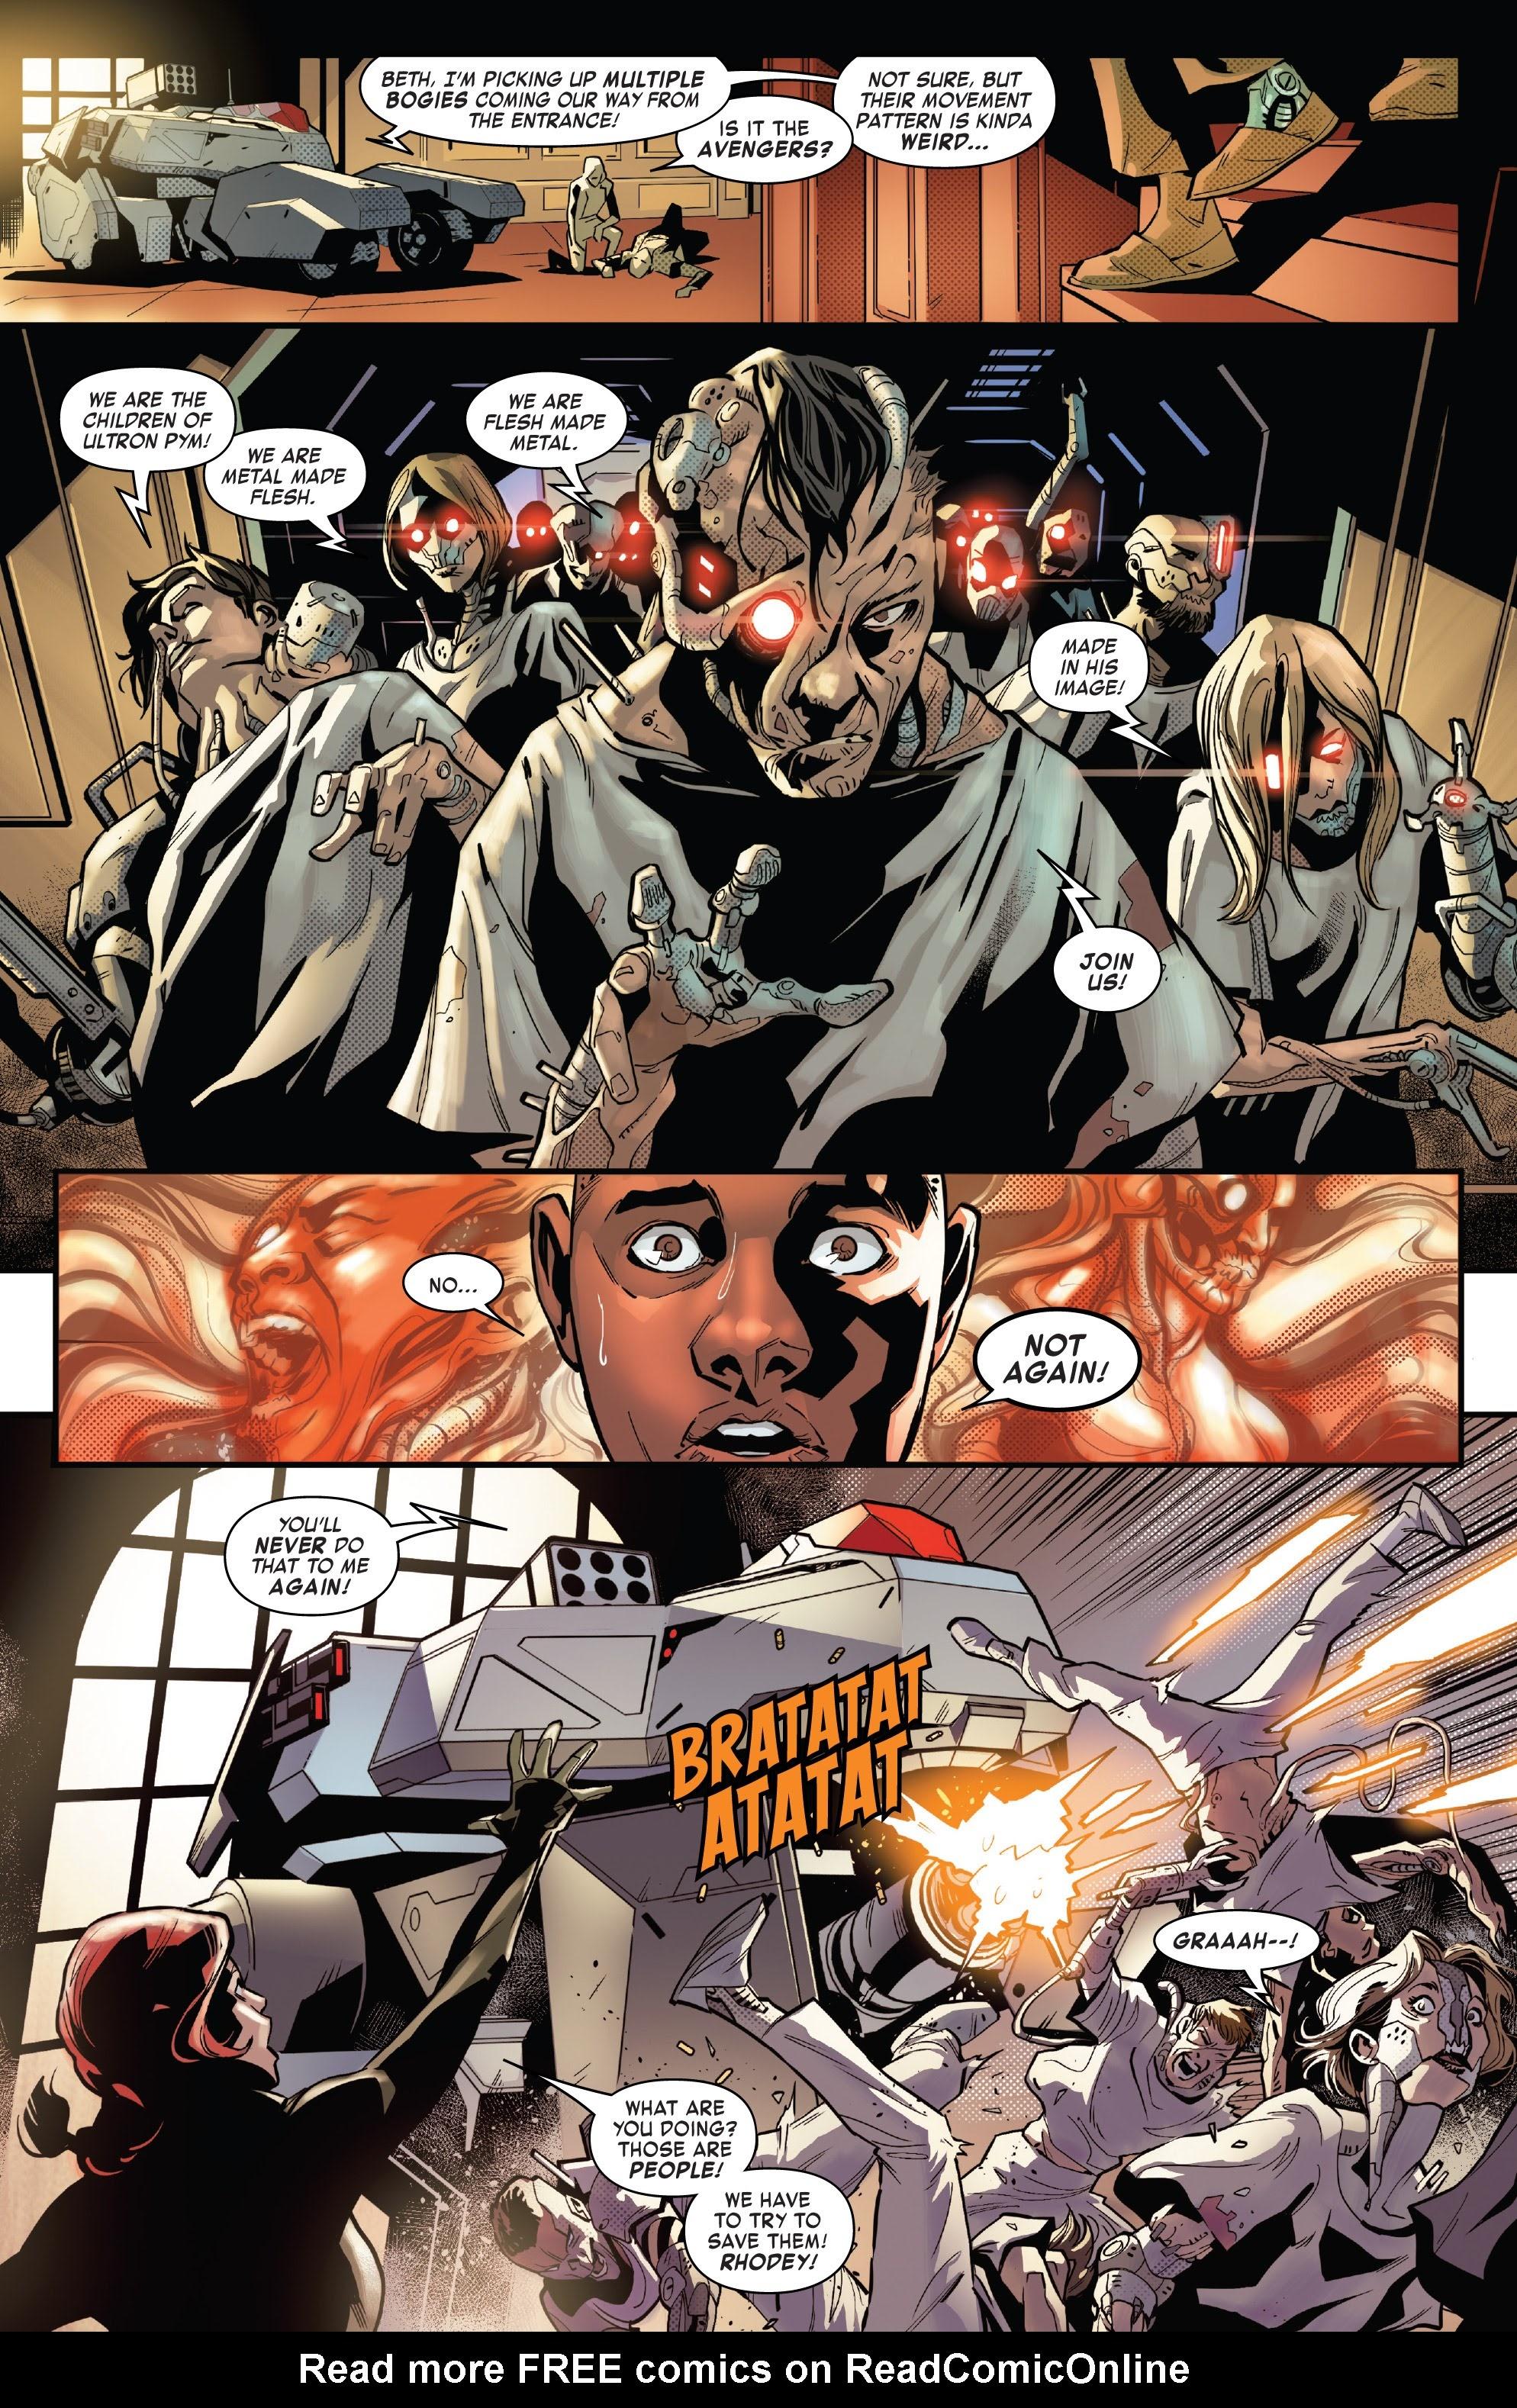 Read online Tony Stark: Iron Man comic -  Issue #16 - 17